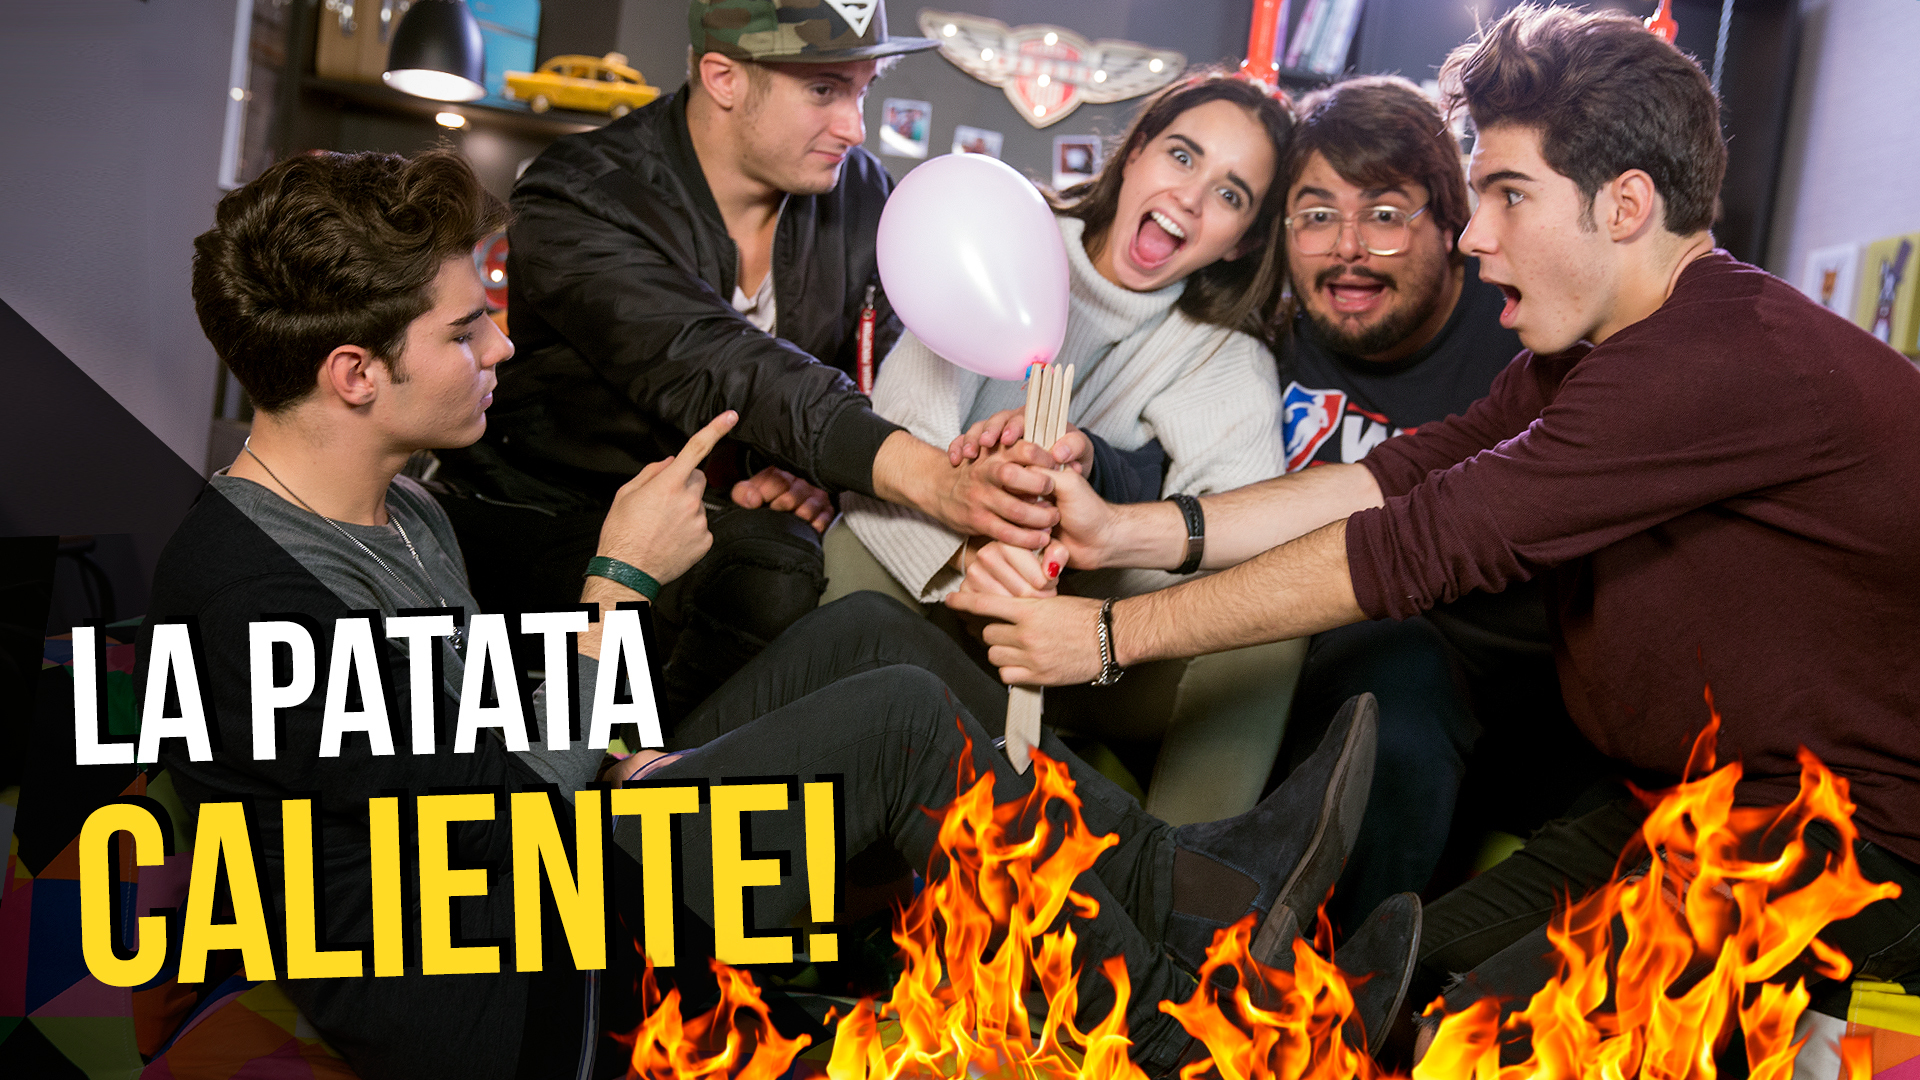 Temporada 1 'Patata Caliente Challenge' con Gemeliers